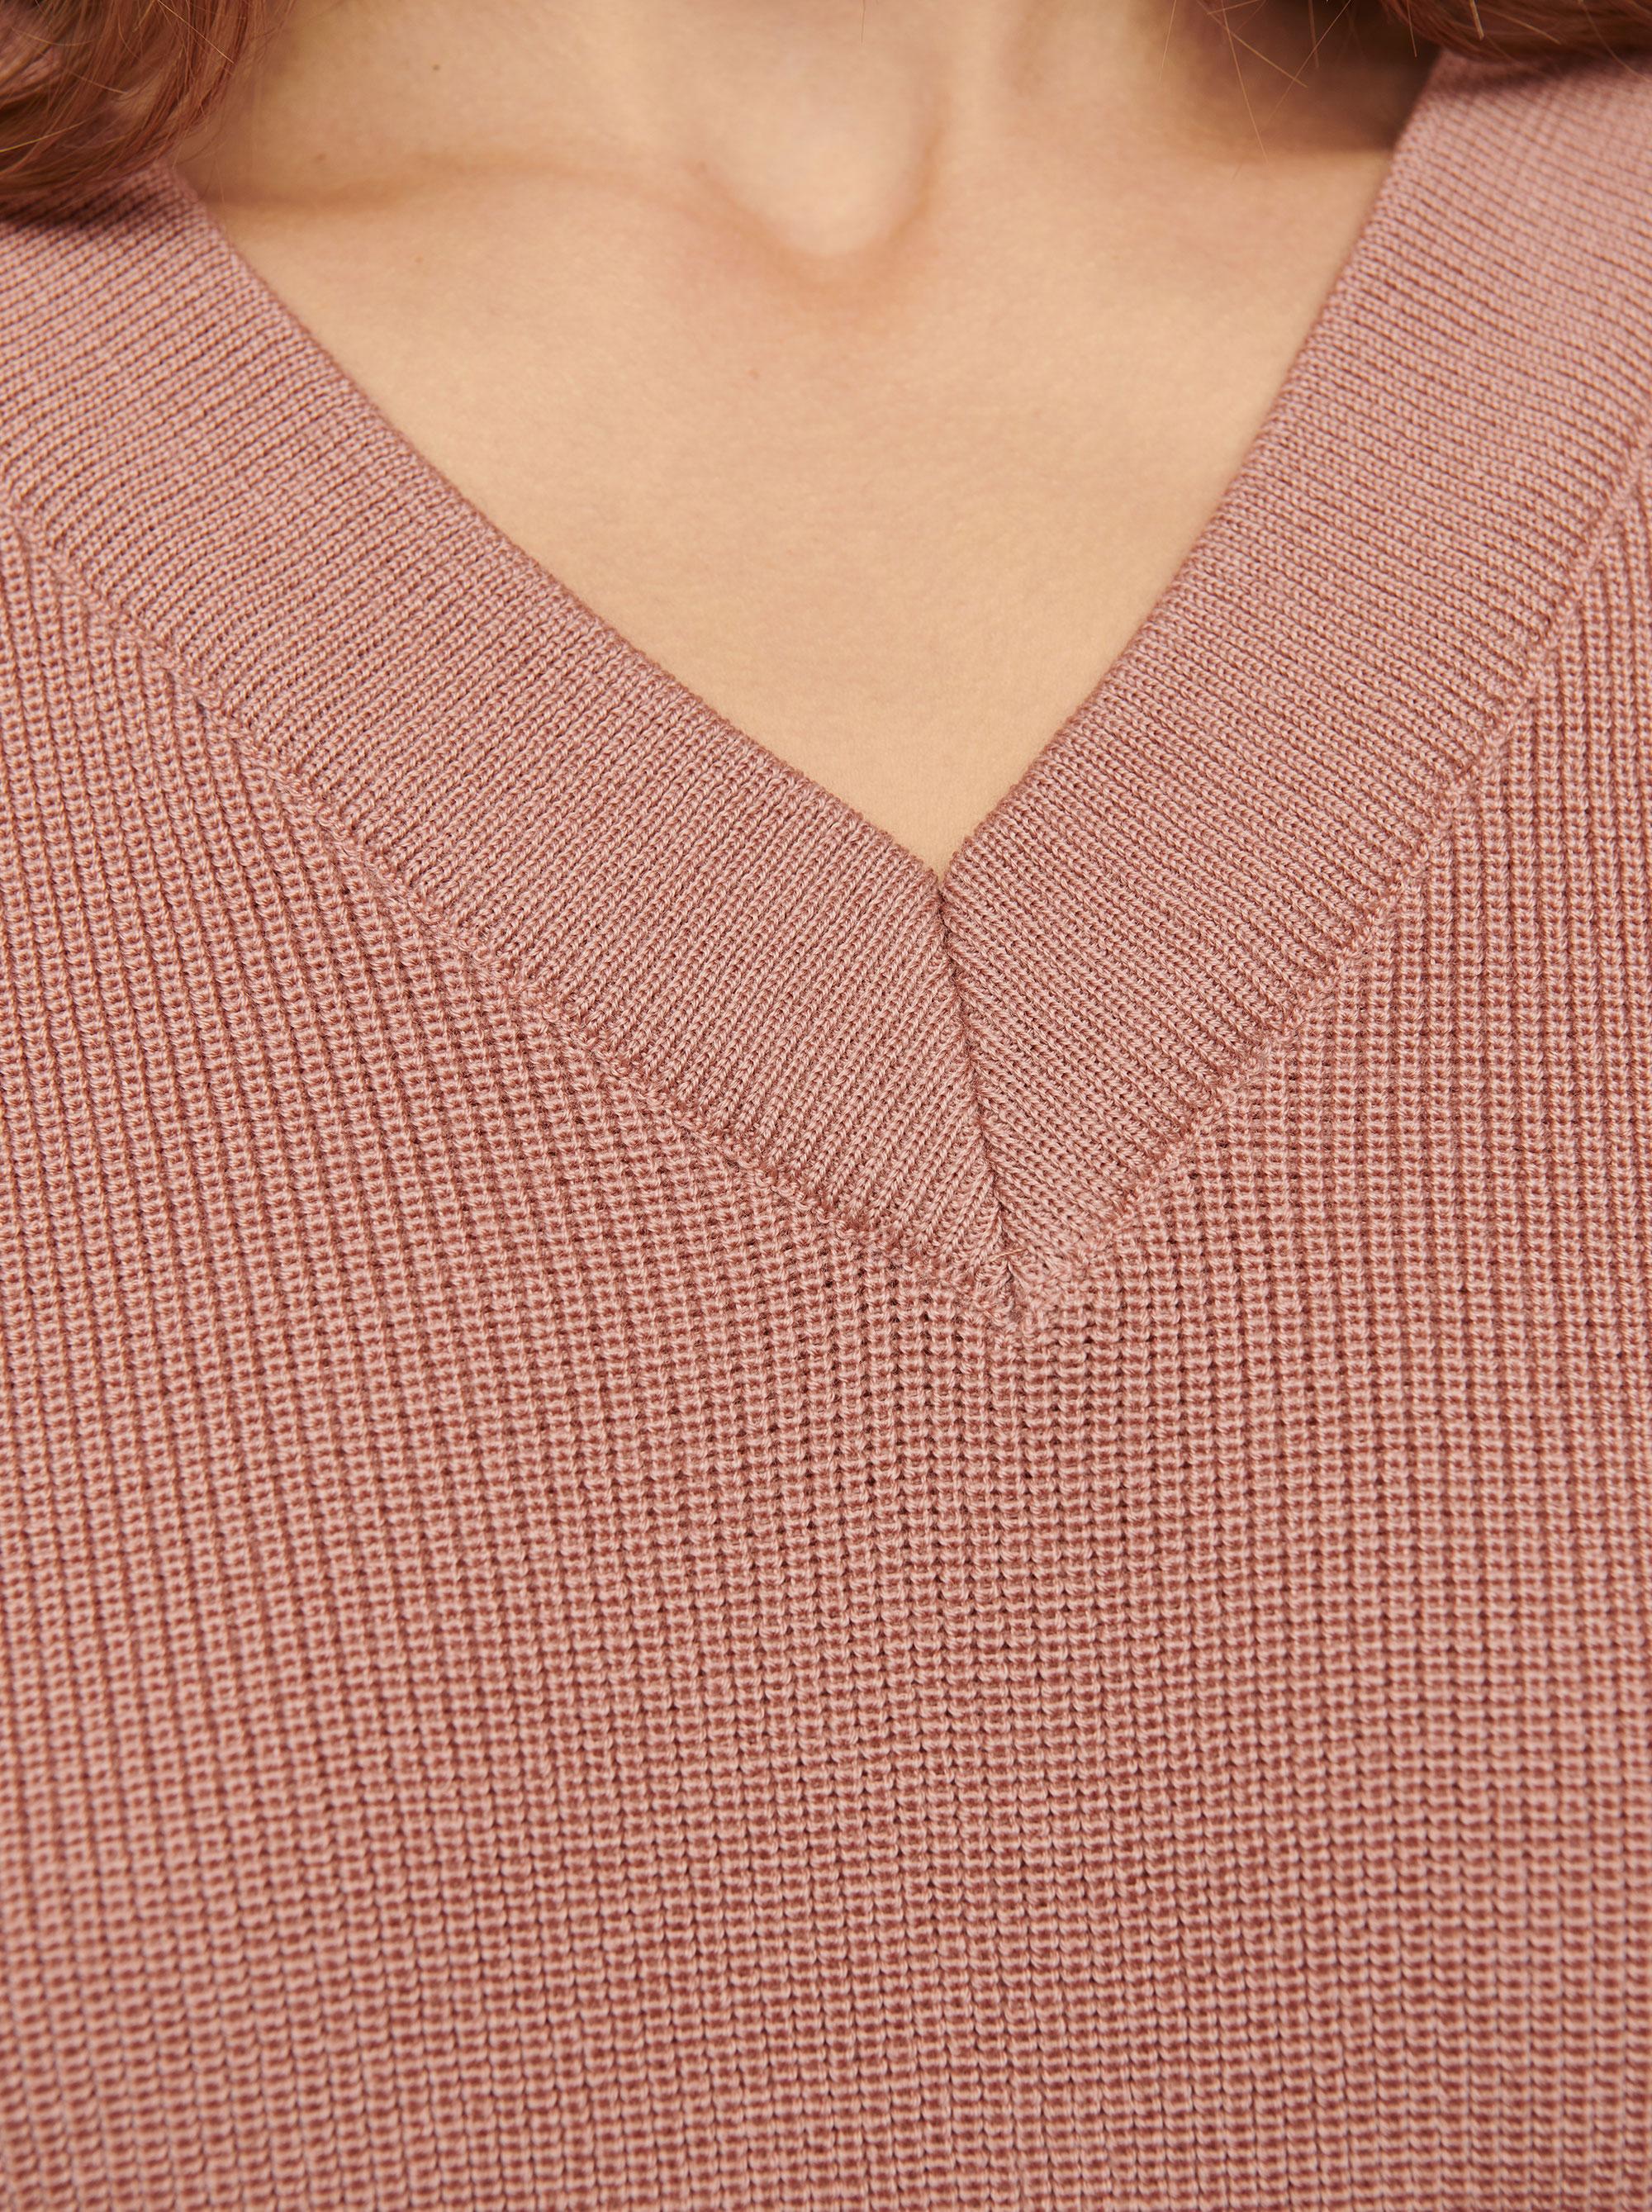 Teym - V-Neck - The Merino Sweater - Women - Pink - 2